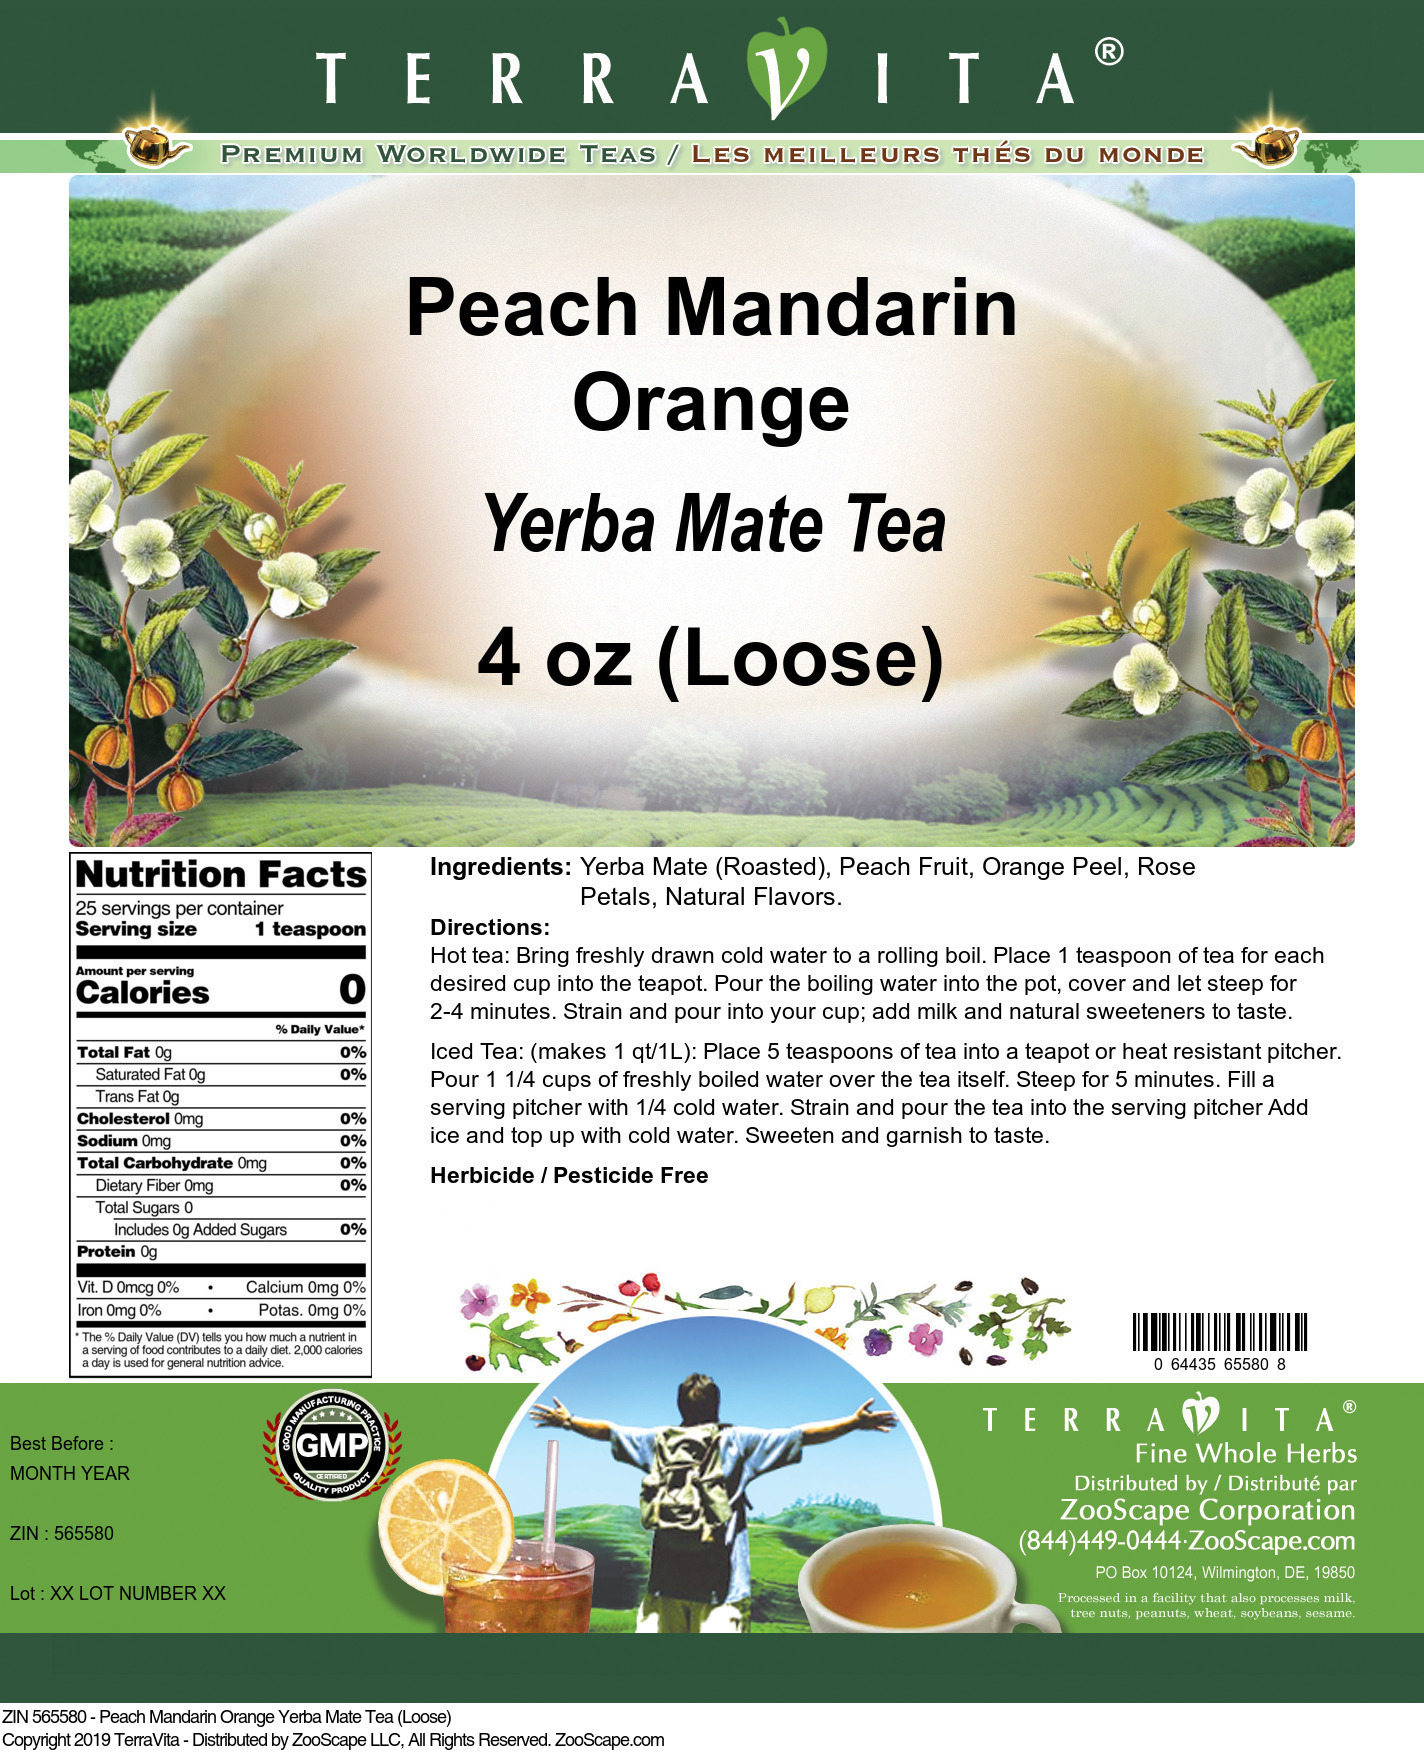 Peach Mandarin Orange Yerba Mate Tea (Loose)